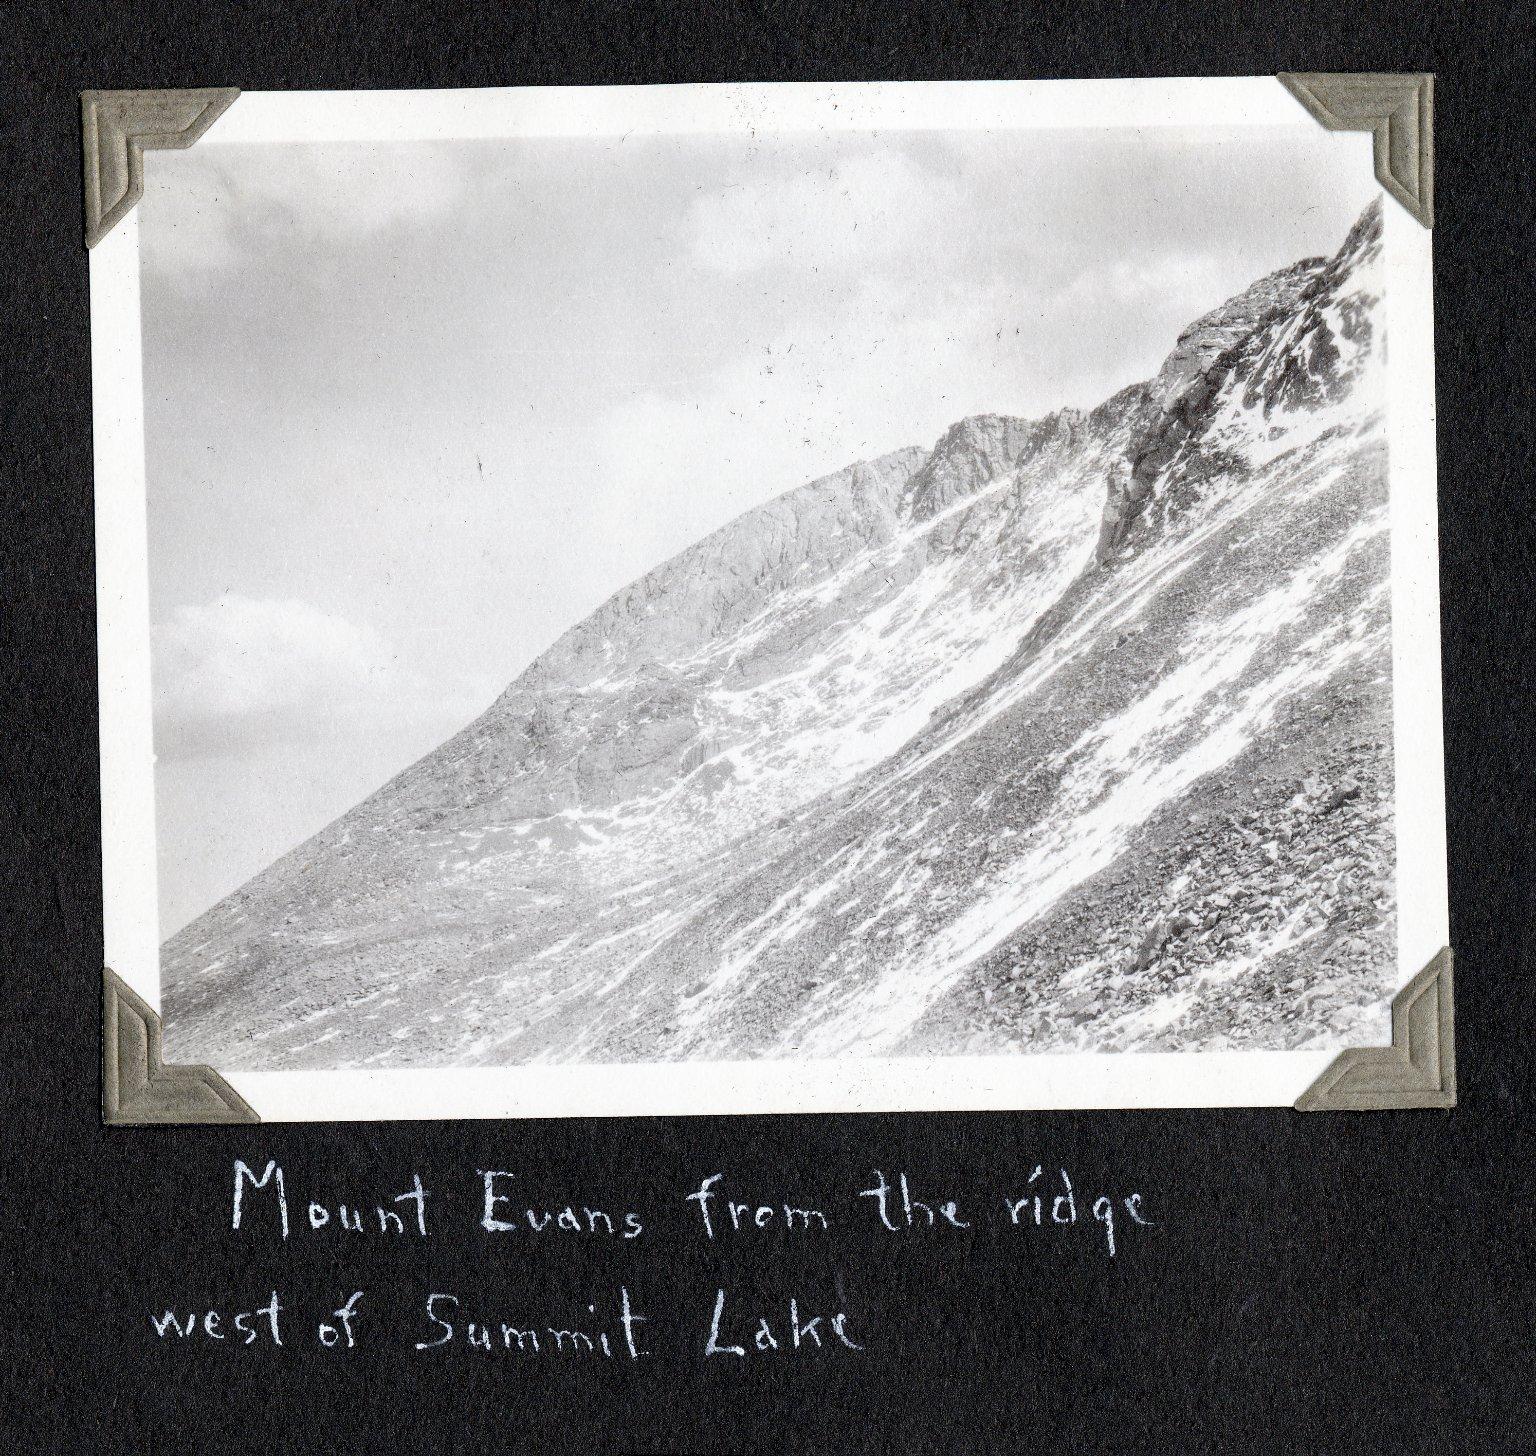 Mount Evans from ridge west of Summit Lake